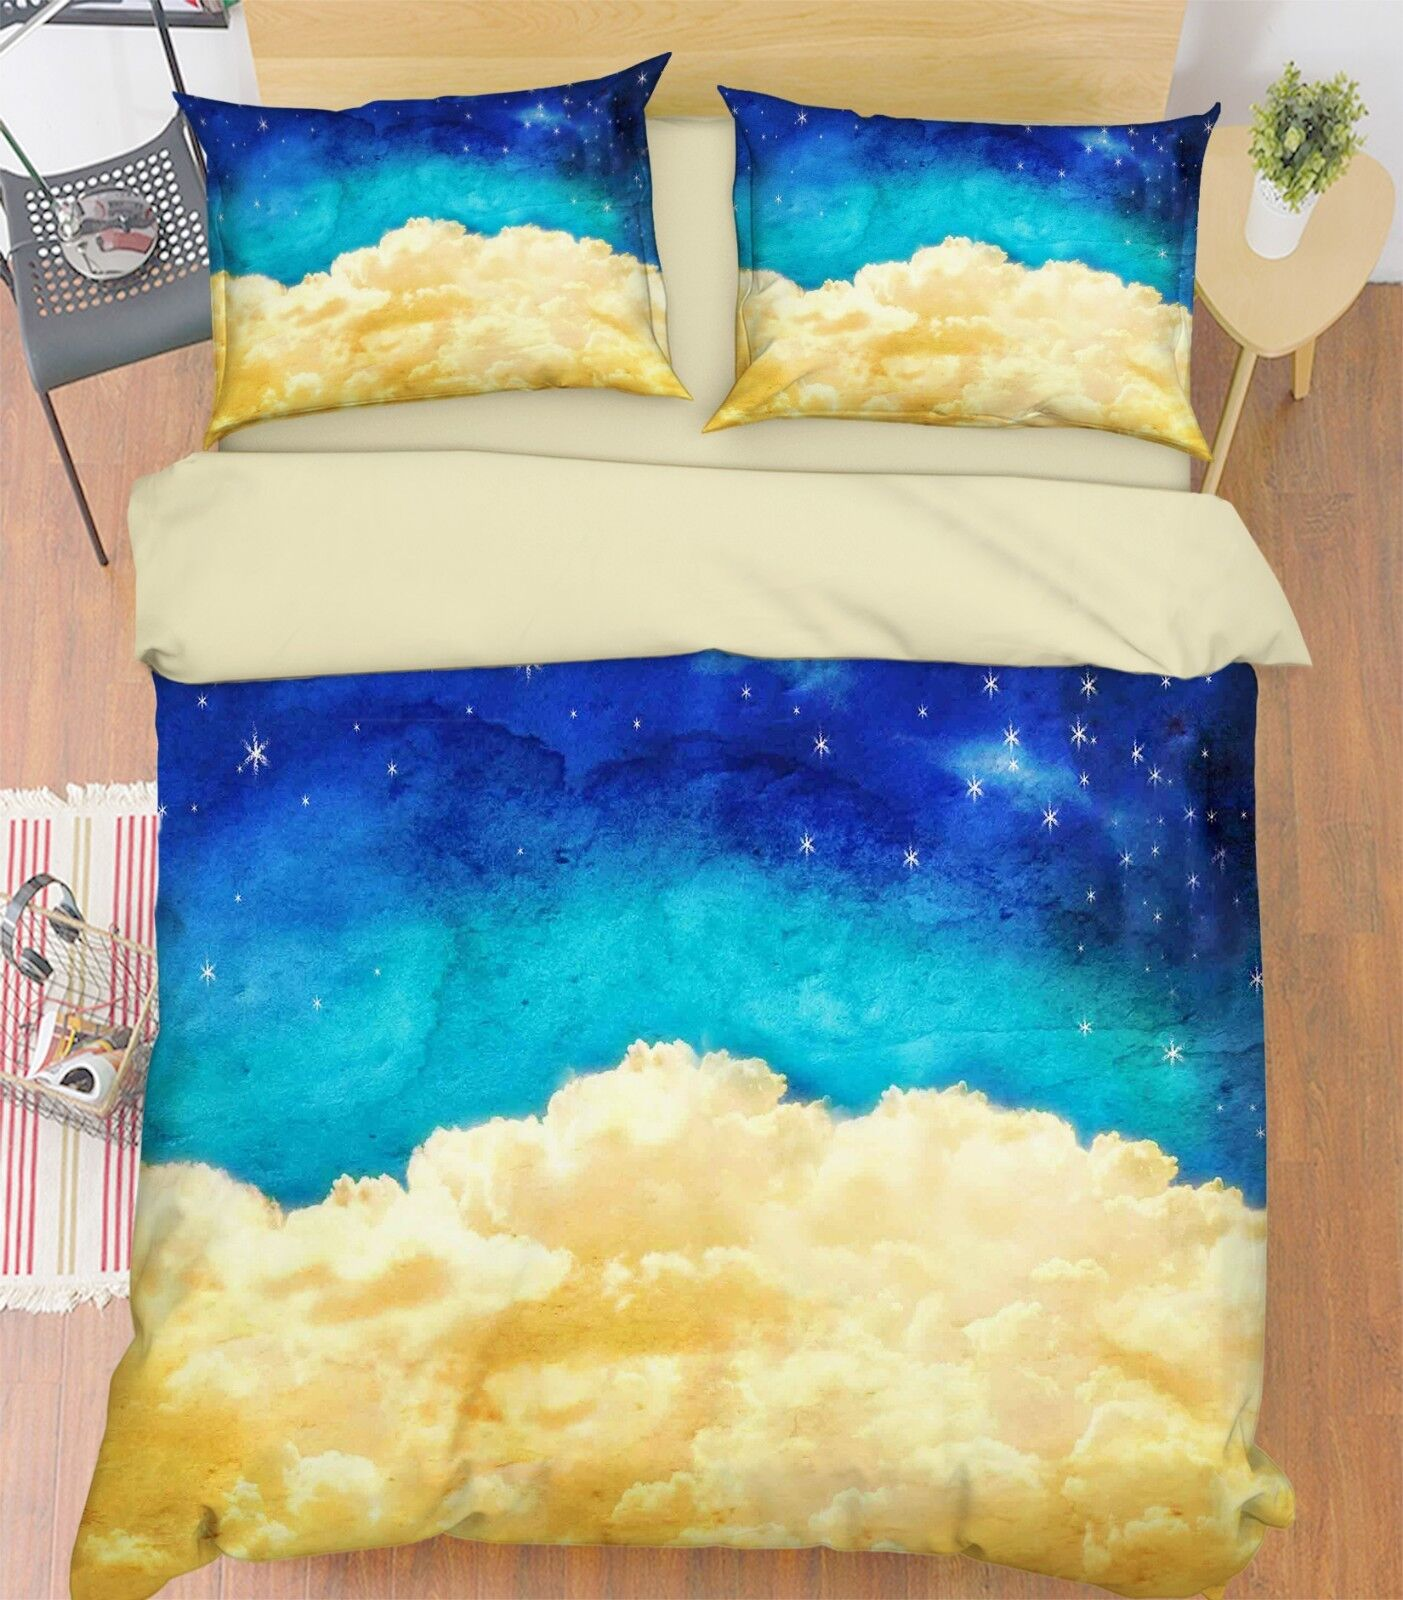 3D Sky Cloud Paint 5 Bed Pillowcases Quilt Duvet Cover Set Single King UK Summer